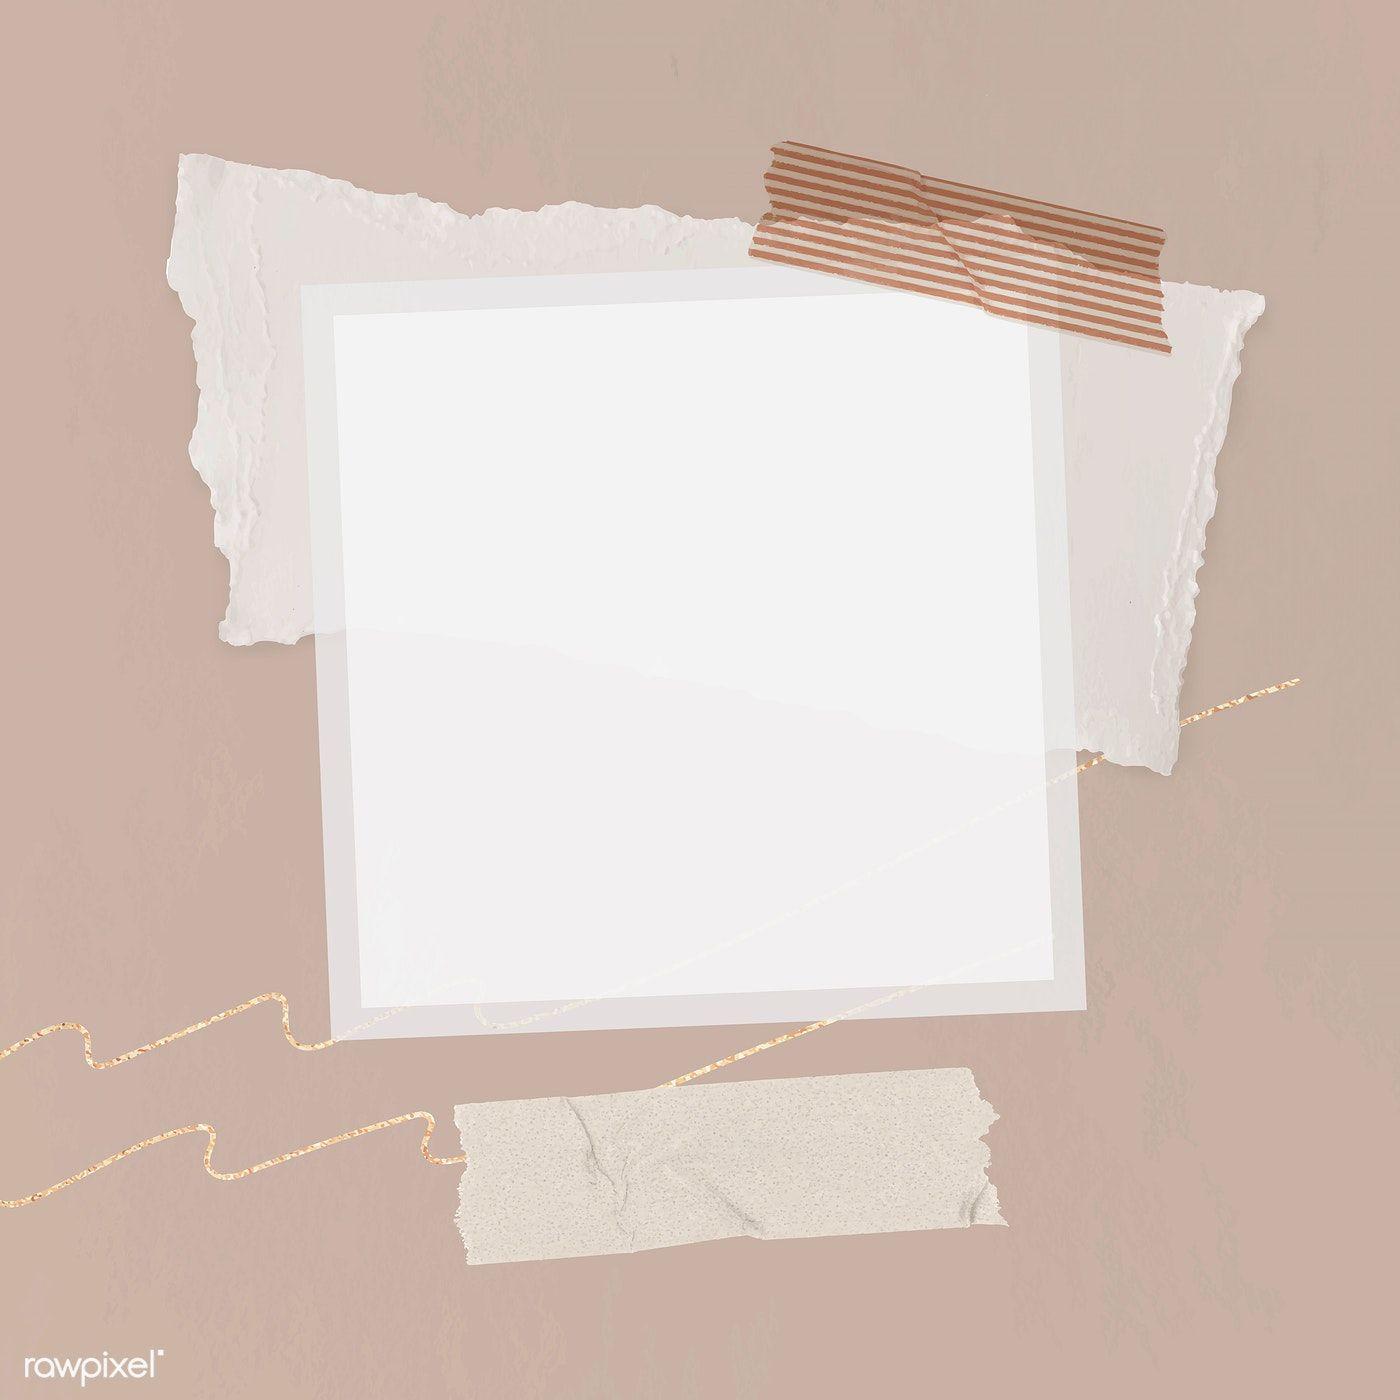 Download Premium Illustration Of Blank Collage Photo Frame